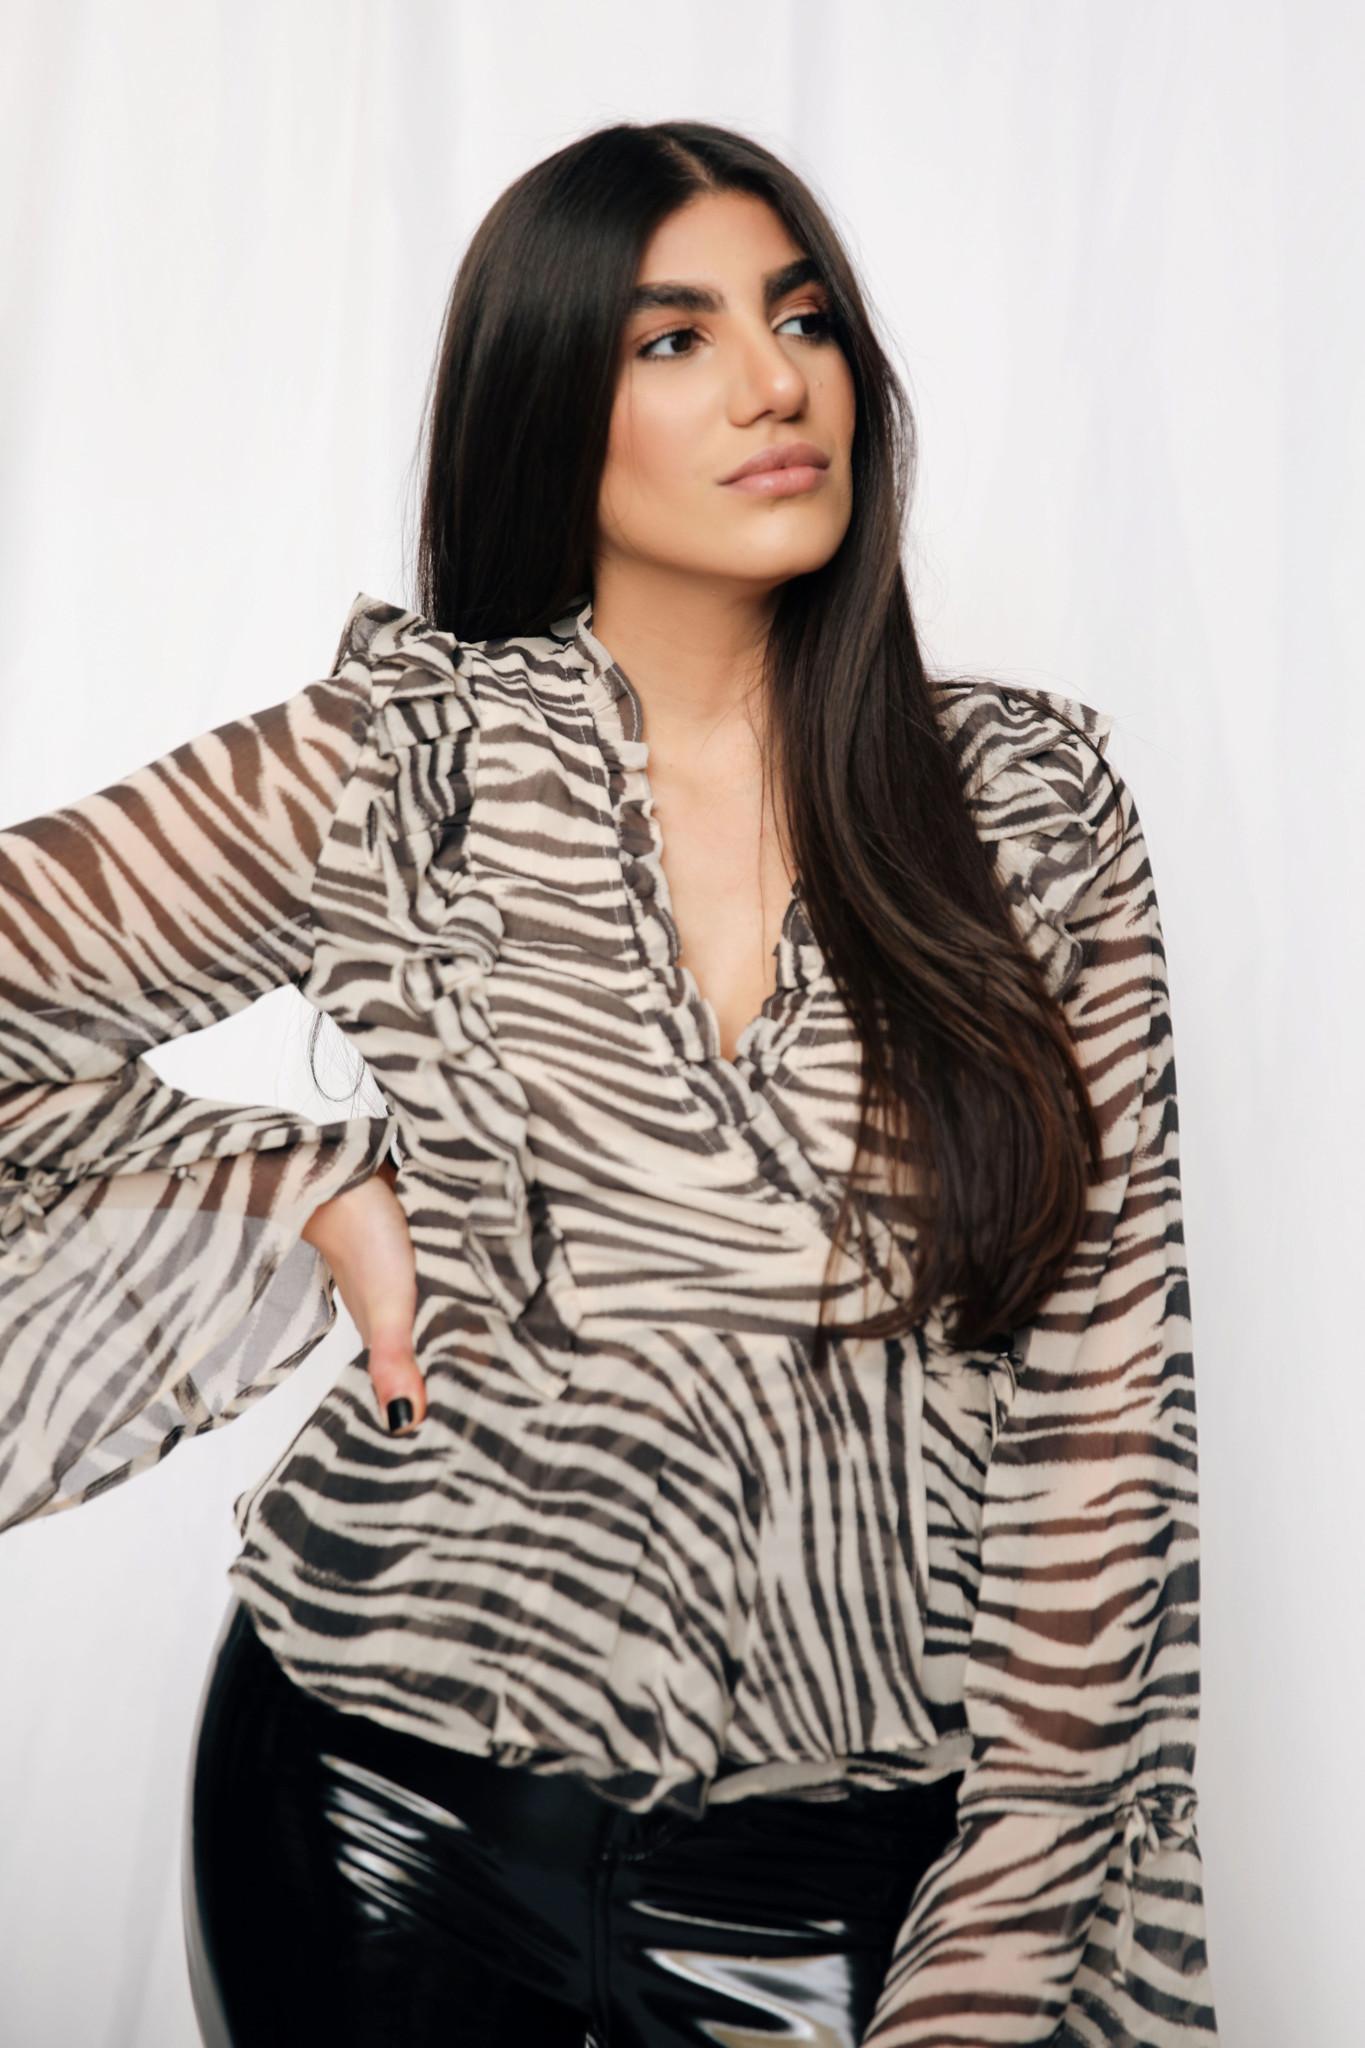 LEXI DREW 9837 Zebra Blouse